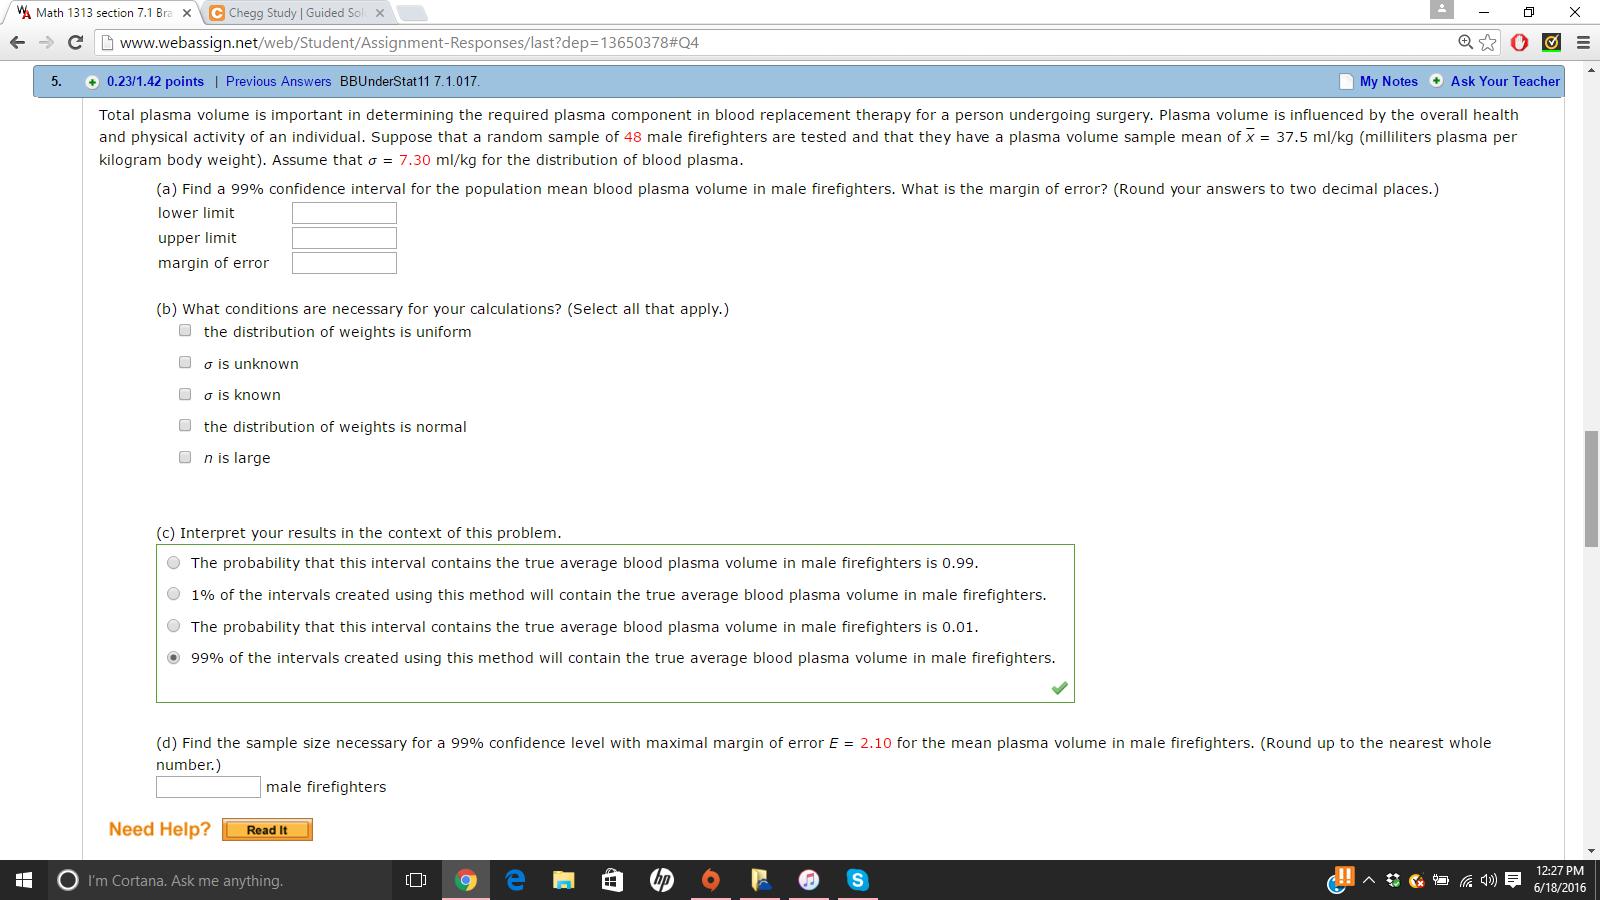 Solved: VA Math 1313 Section 7 1 Bra X C Chegg Study IG Ww